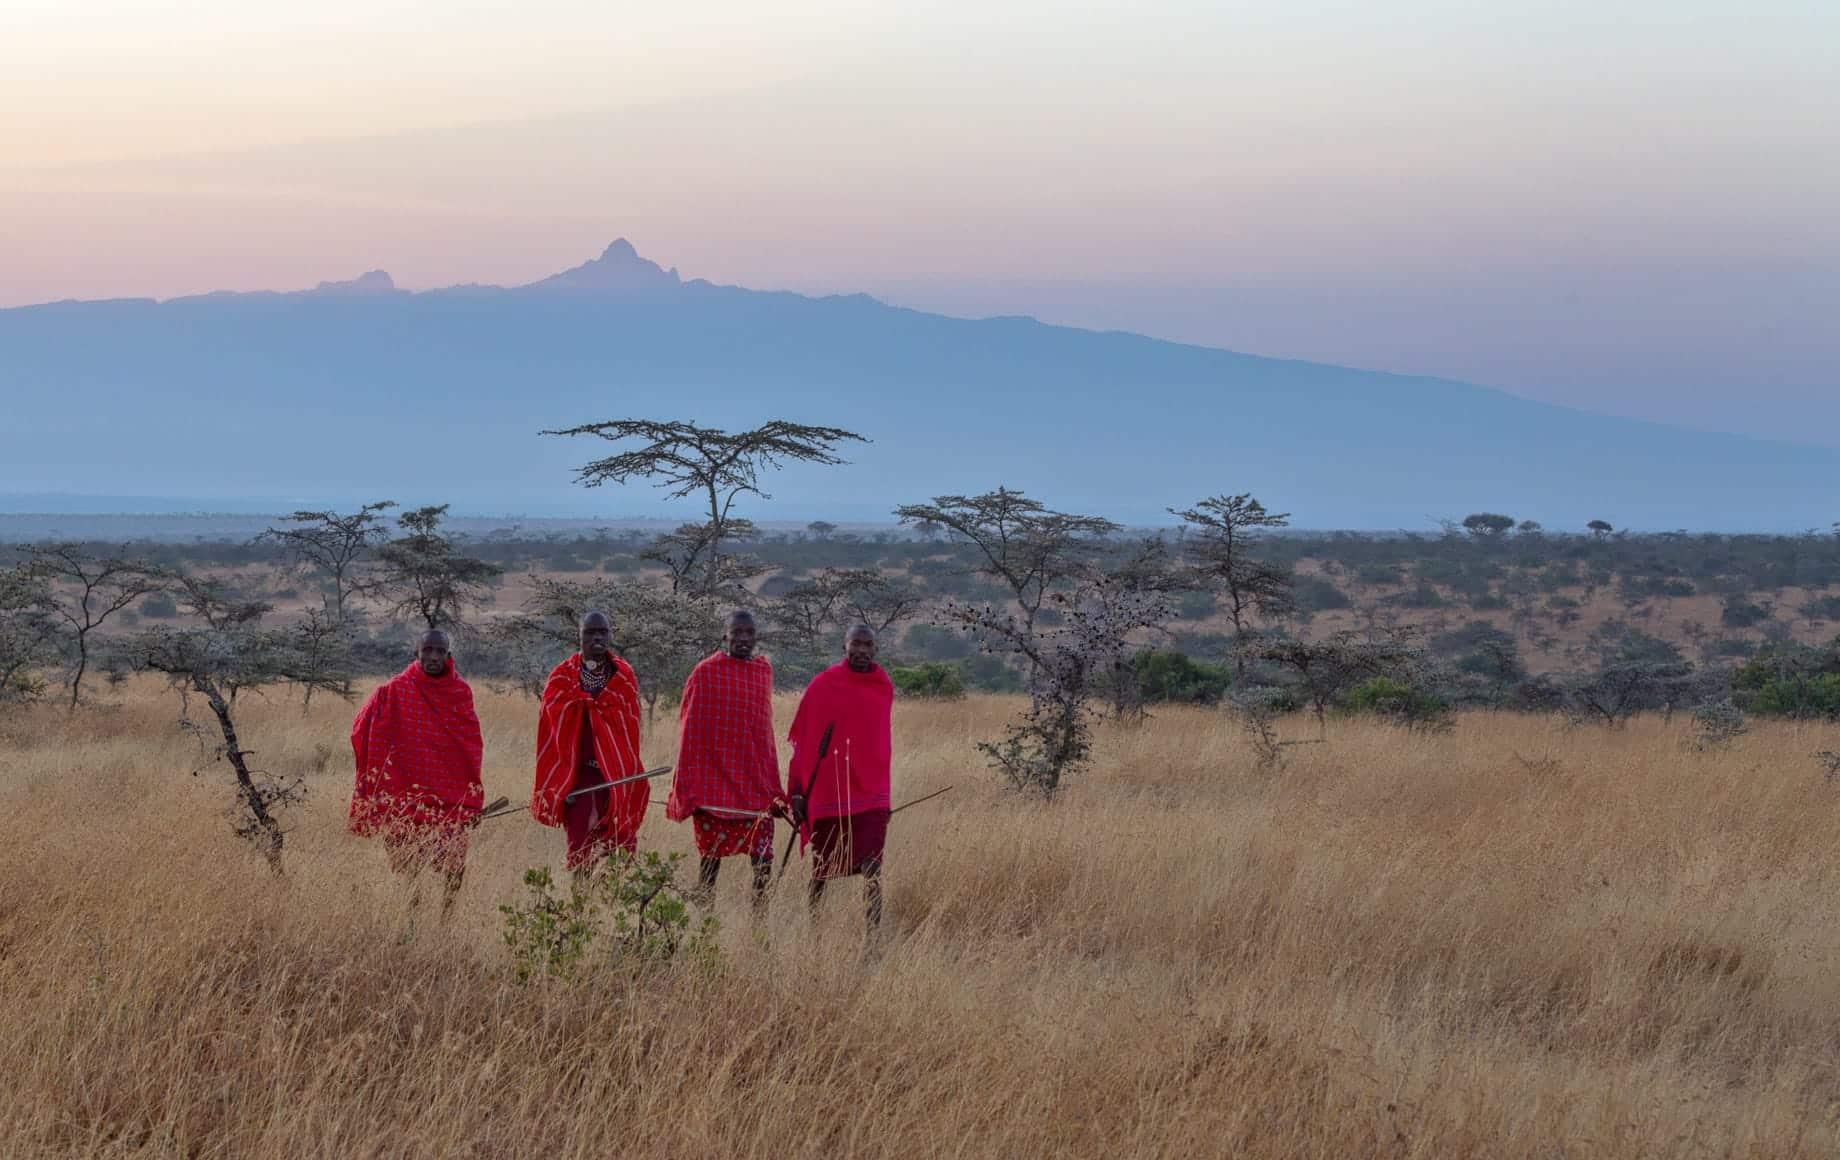 Men strolling at Laikipia Plateau African Safari